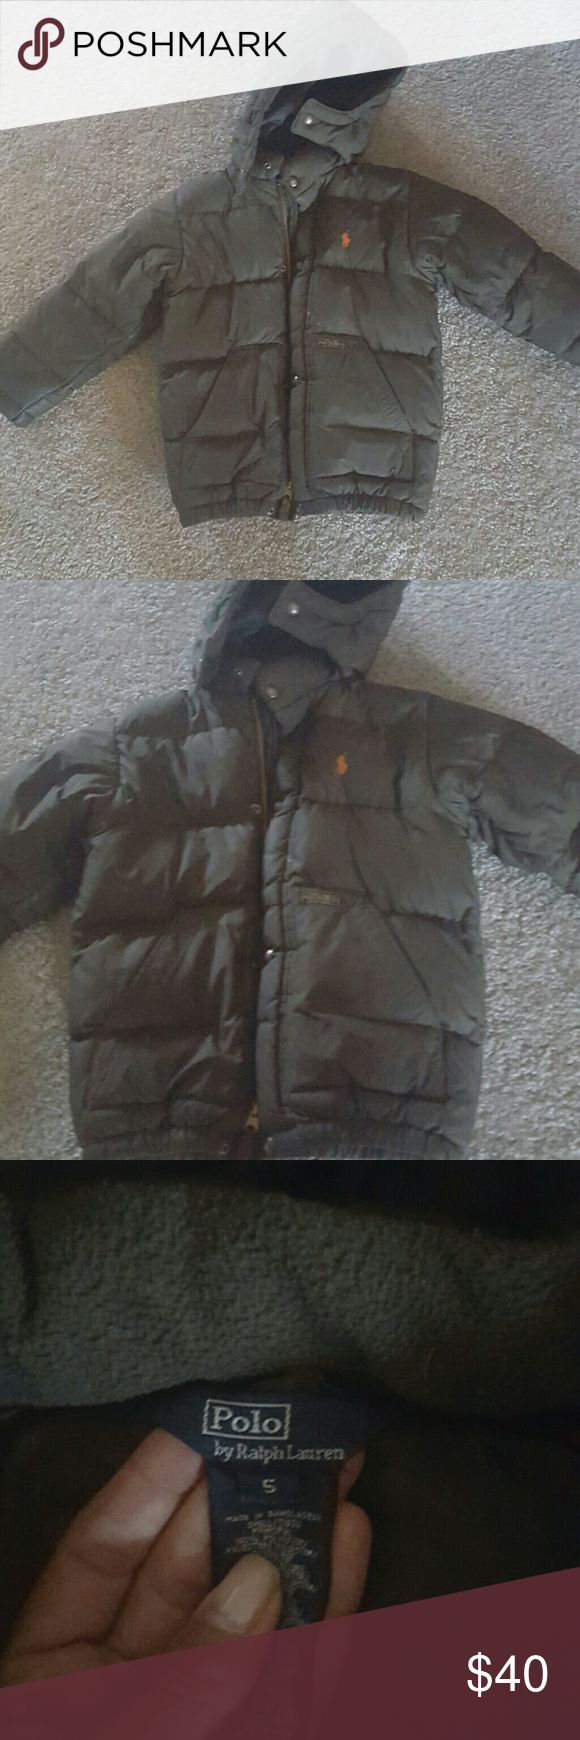 Ralph Lauren boys winter coat Down fill boys winter coat with detachable hood . Ralph Lauren Jackets & Coats Puffers